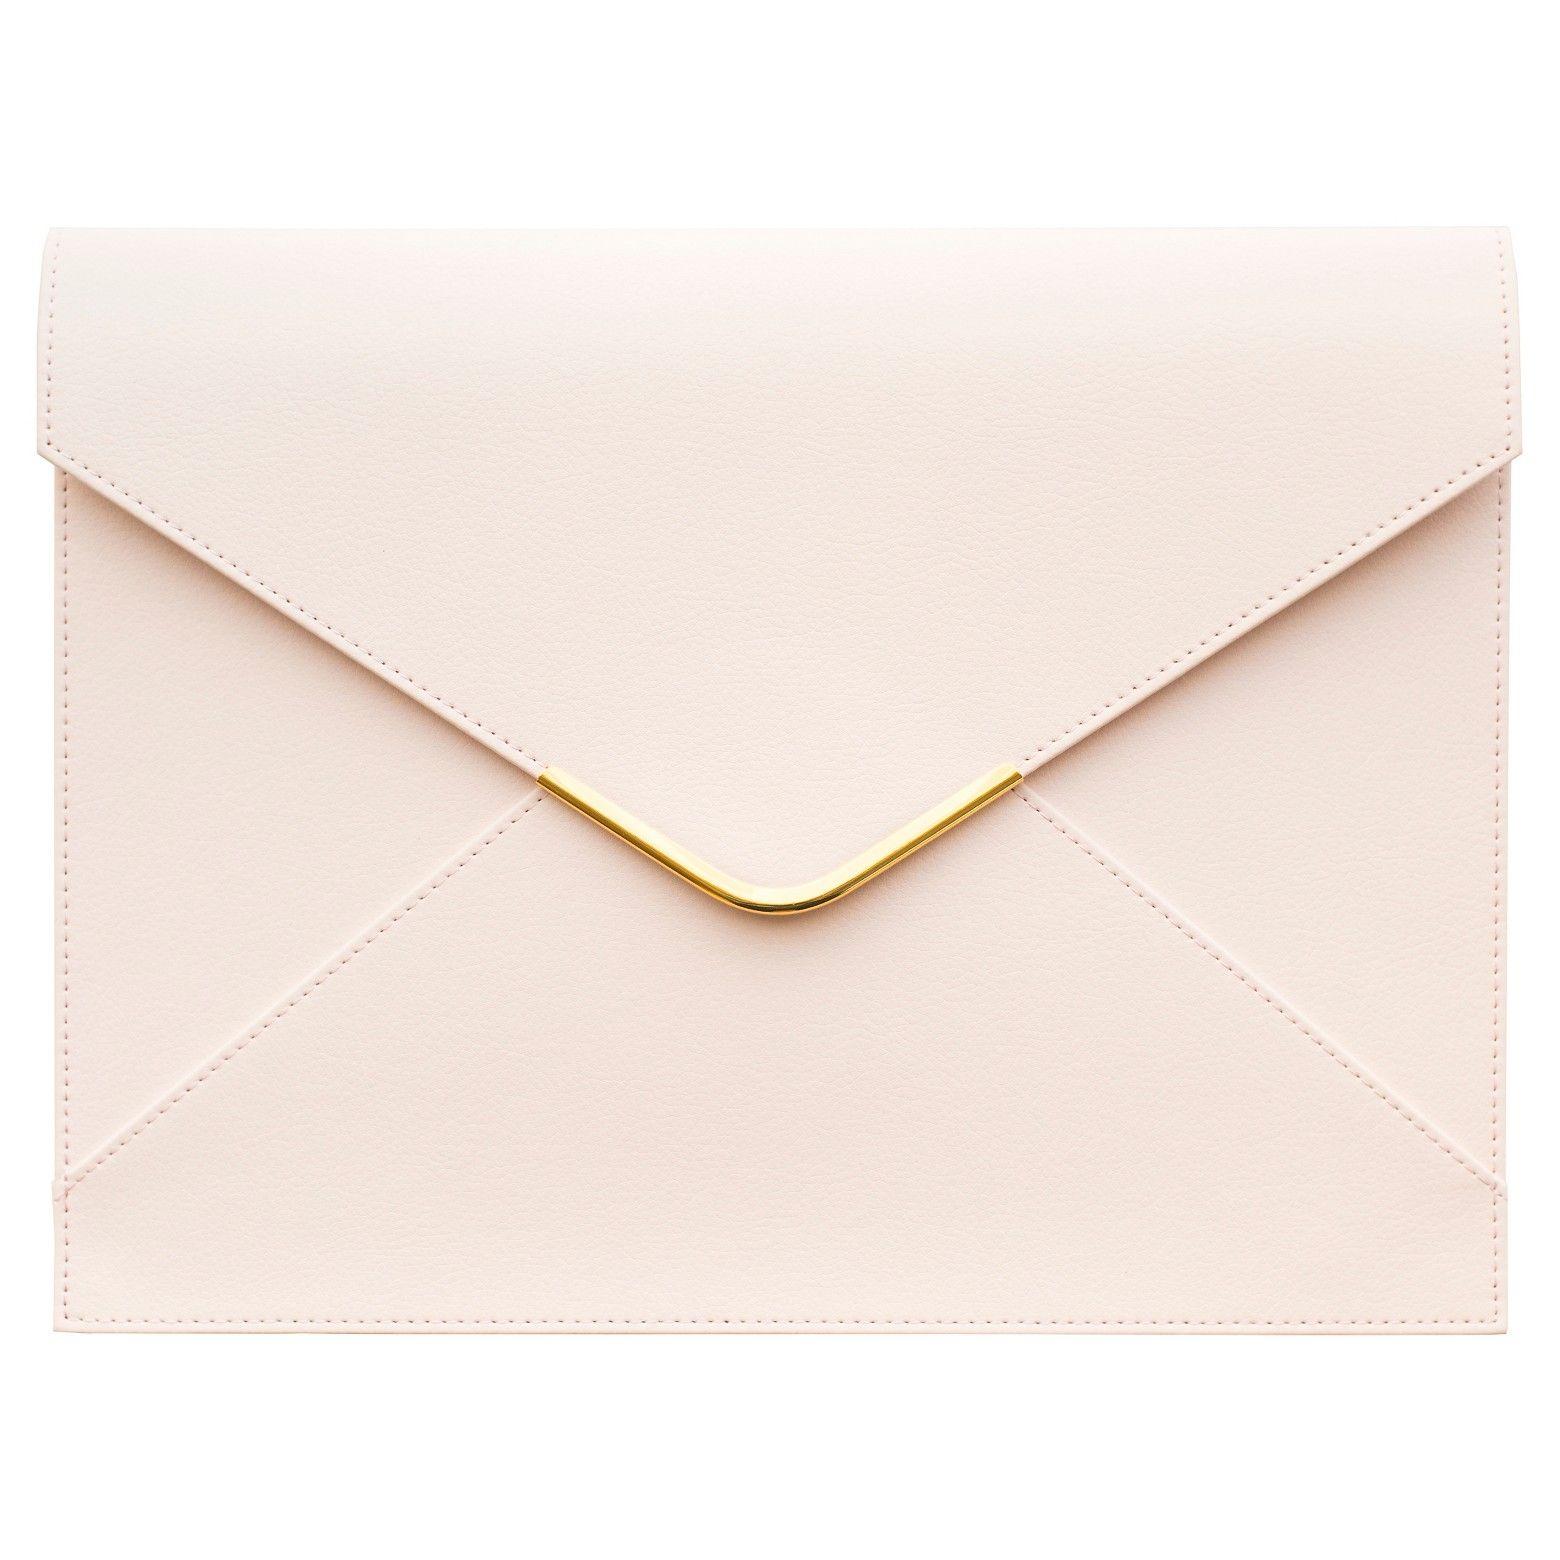 Sugar Paper Has Reintroduced The Envelope Document Holder